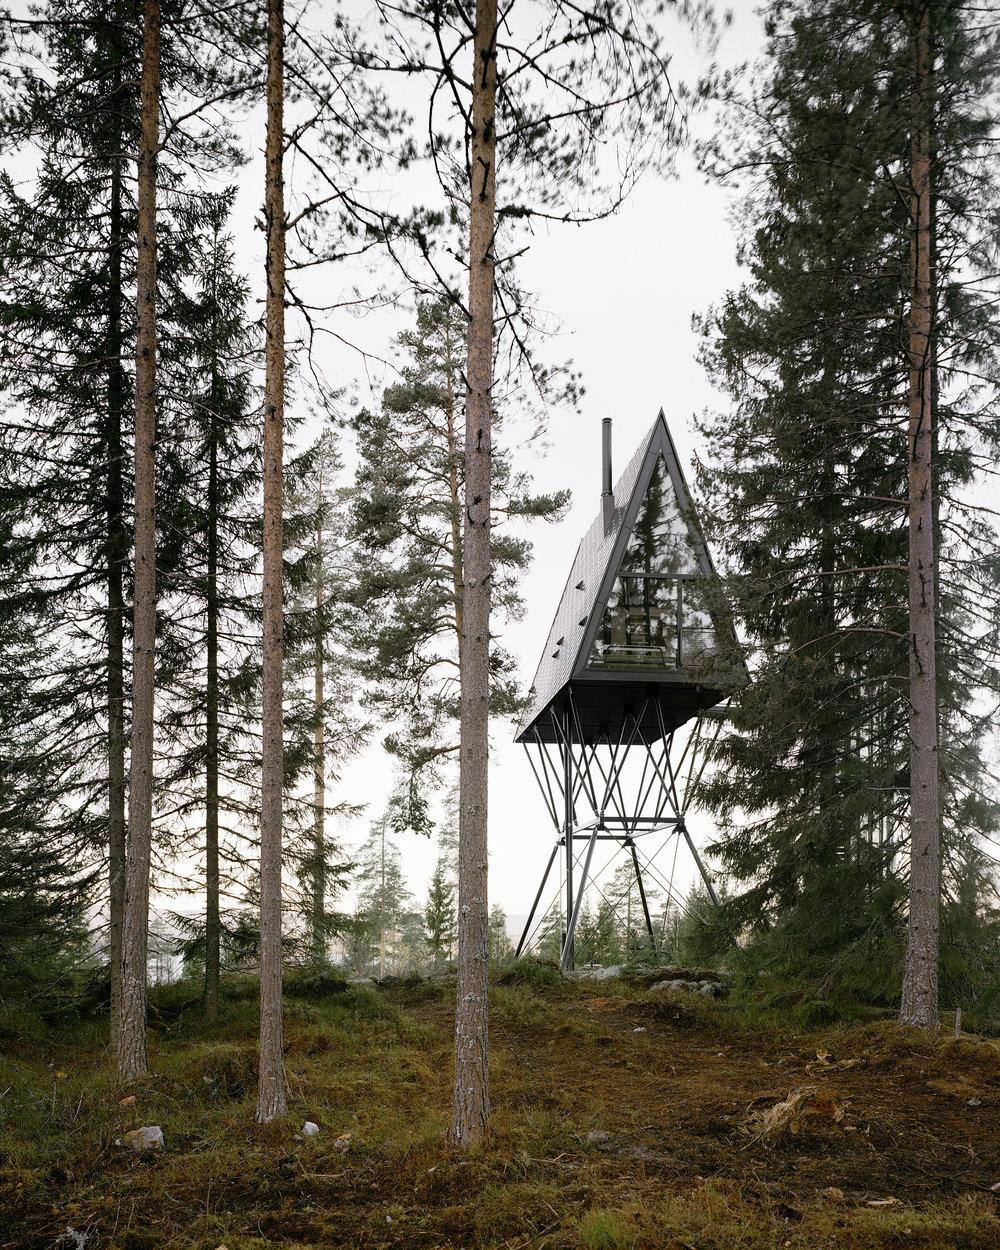 espen surnevik PAN cabins 7 photo Rasmus Norlander.jpg